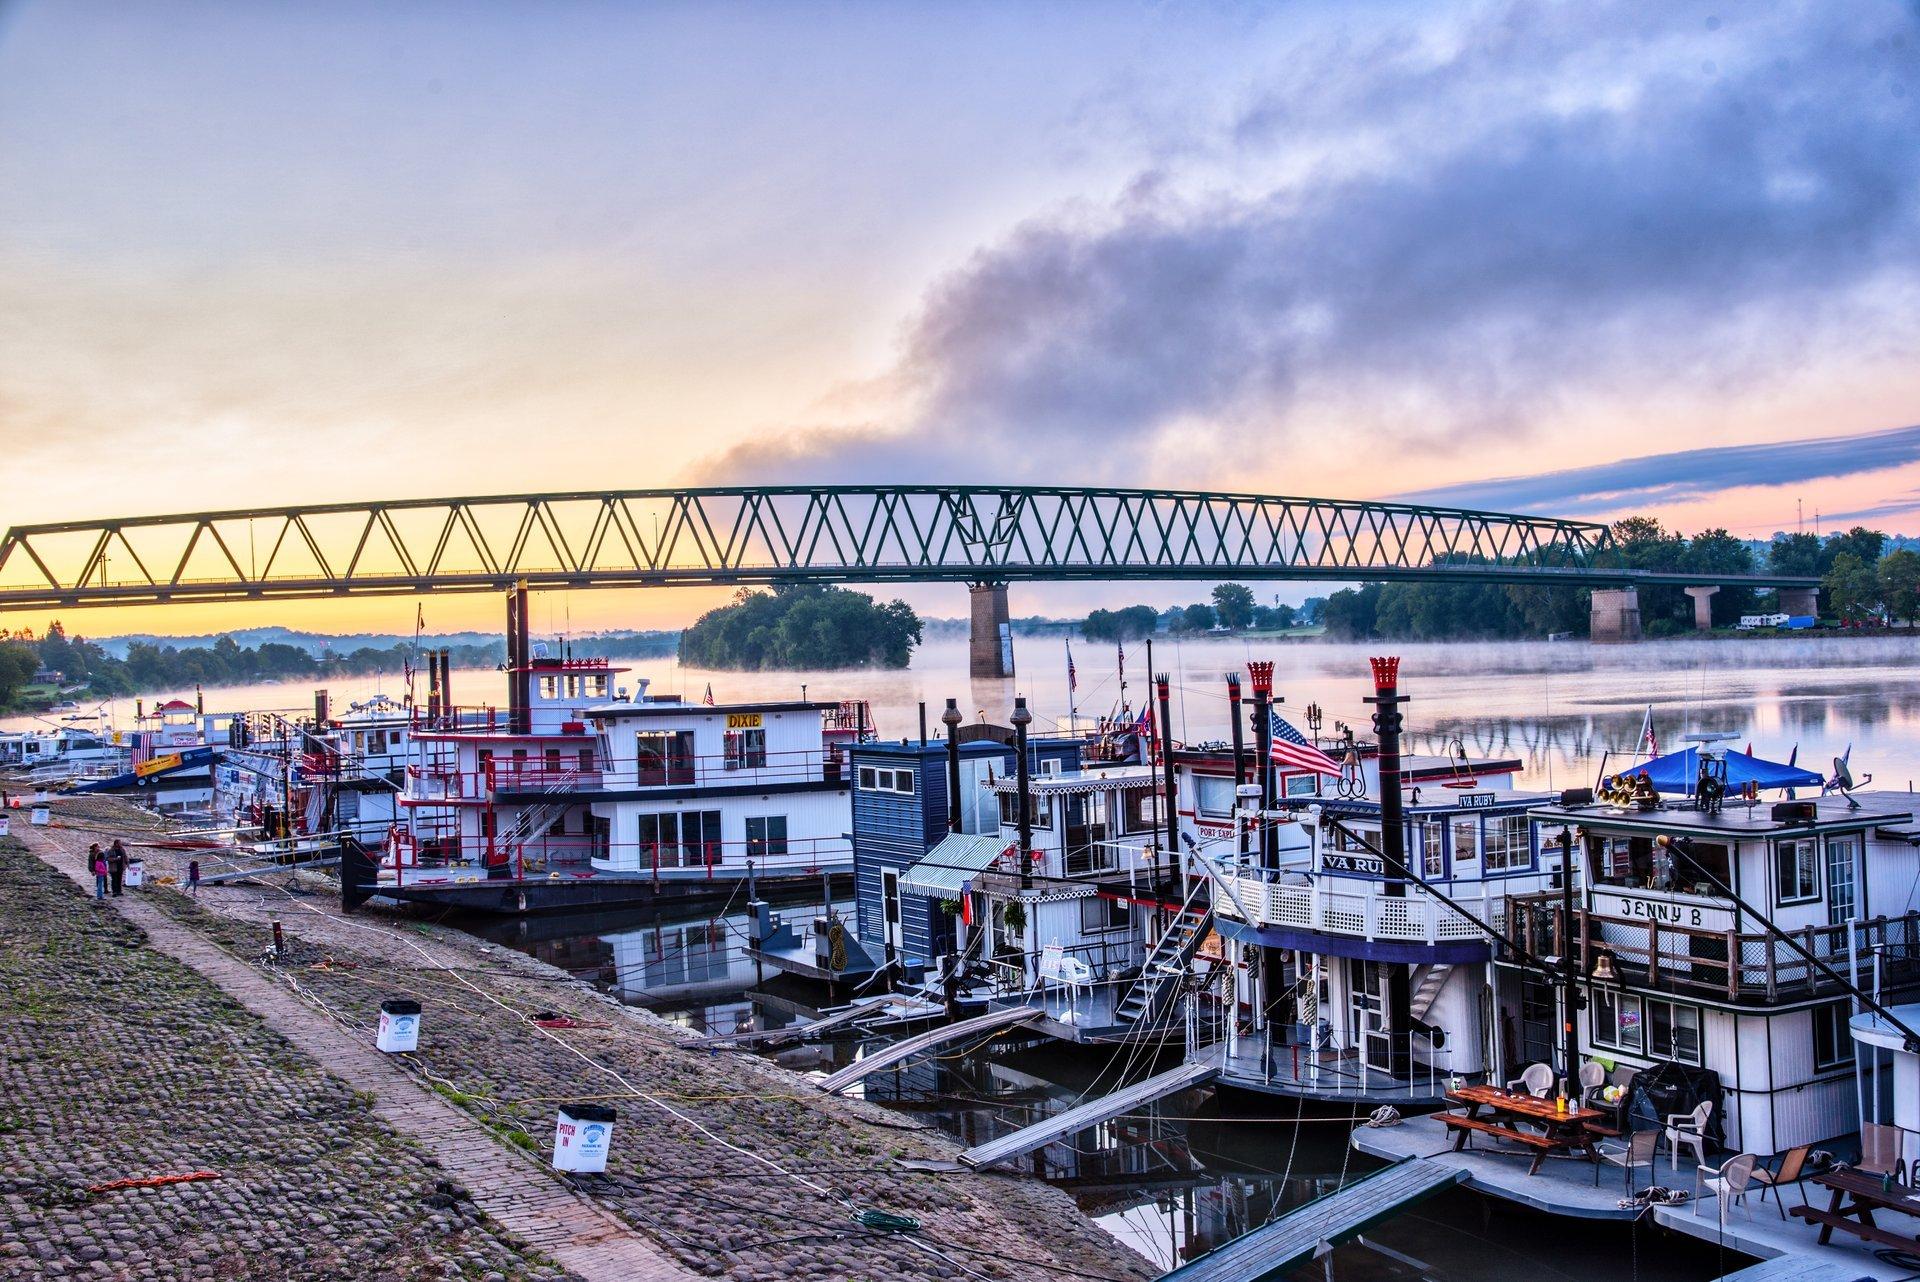 Ohio River Sternwheel Festival in Ohio - Best Season 2020